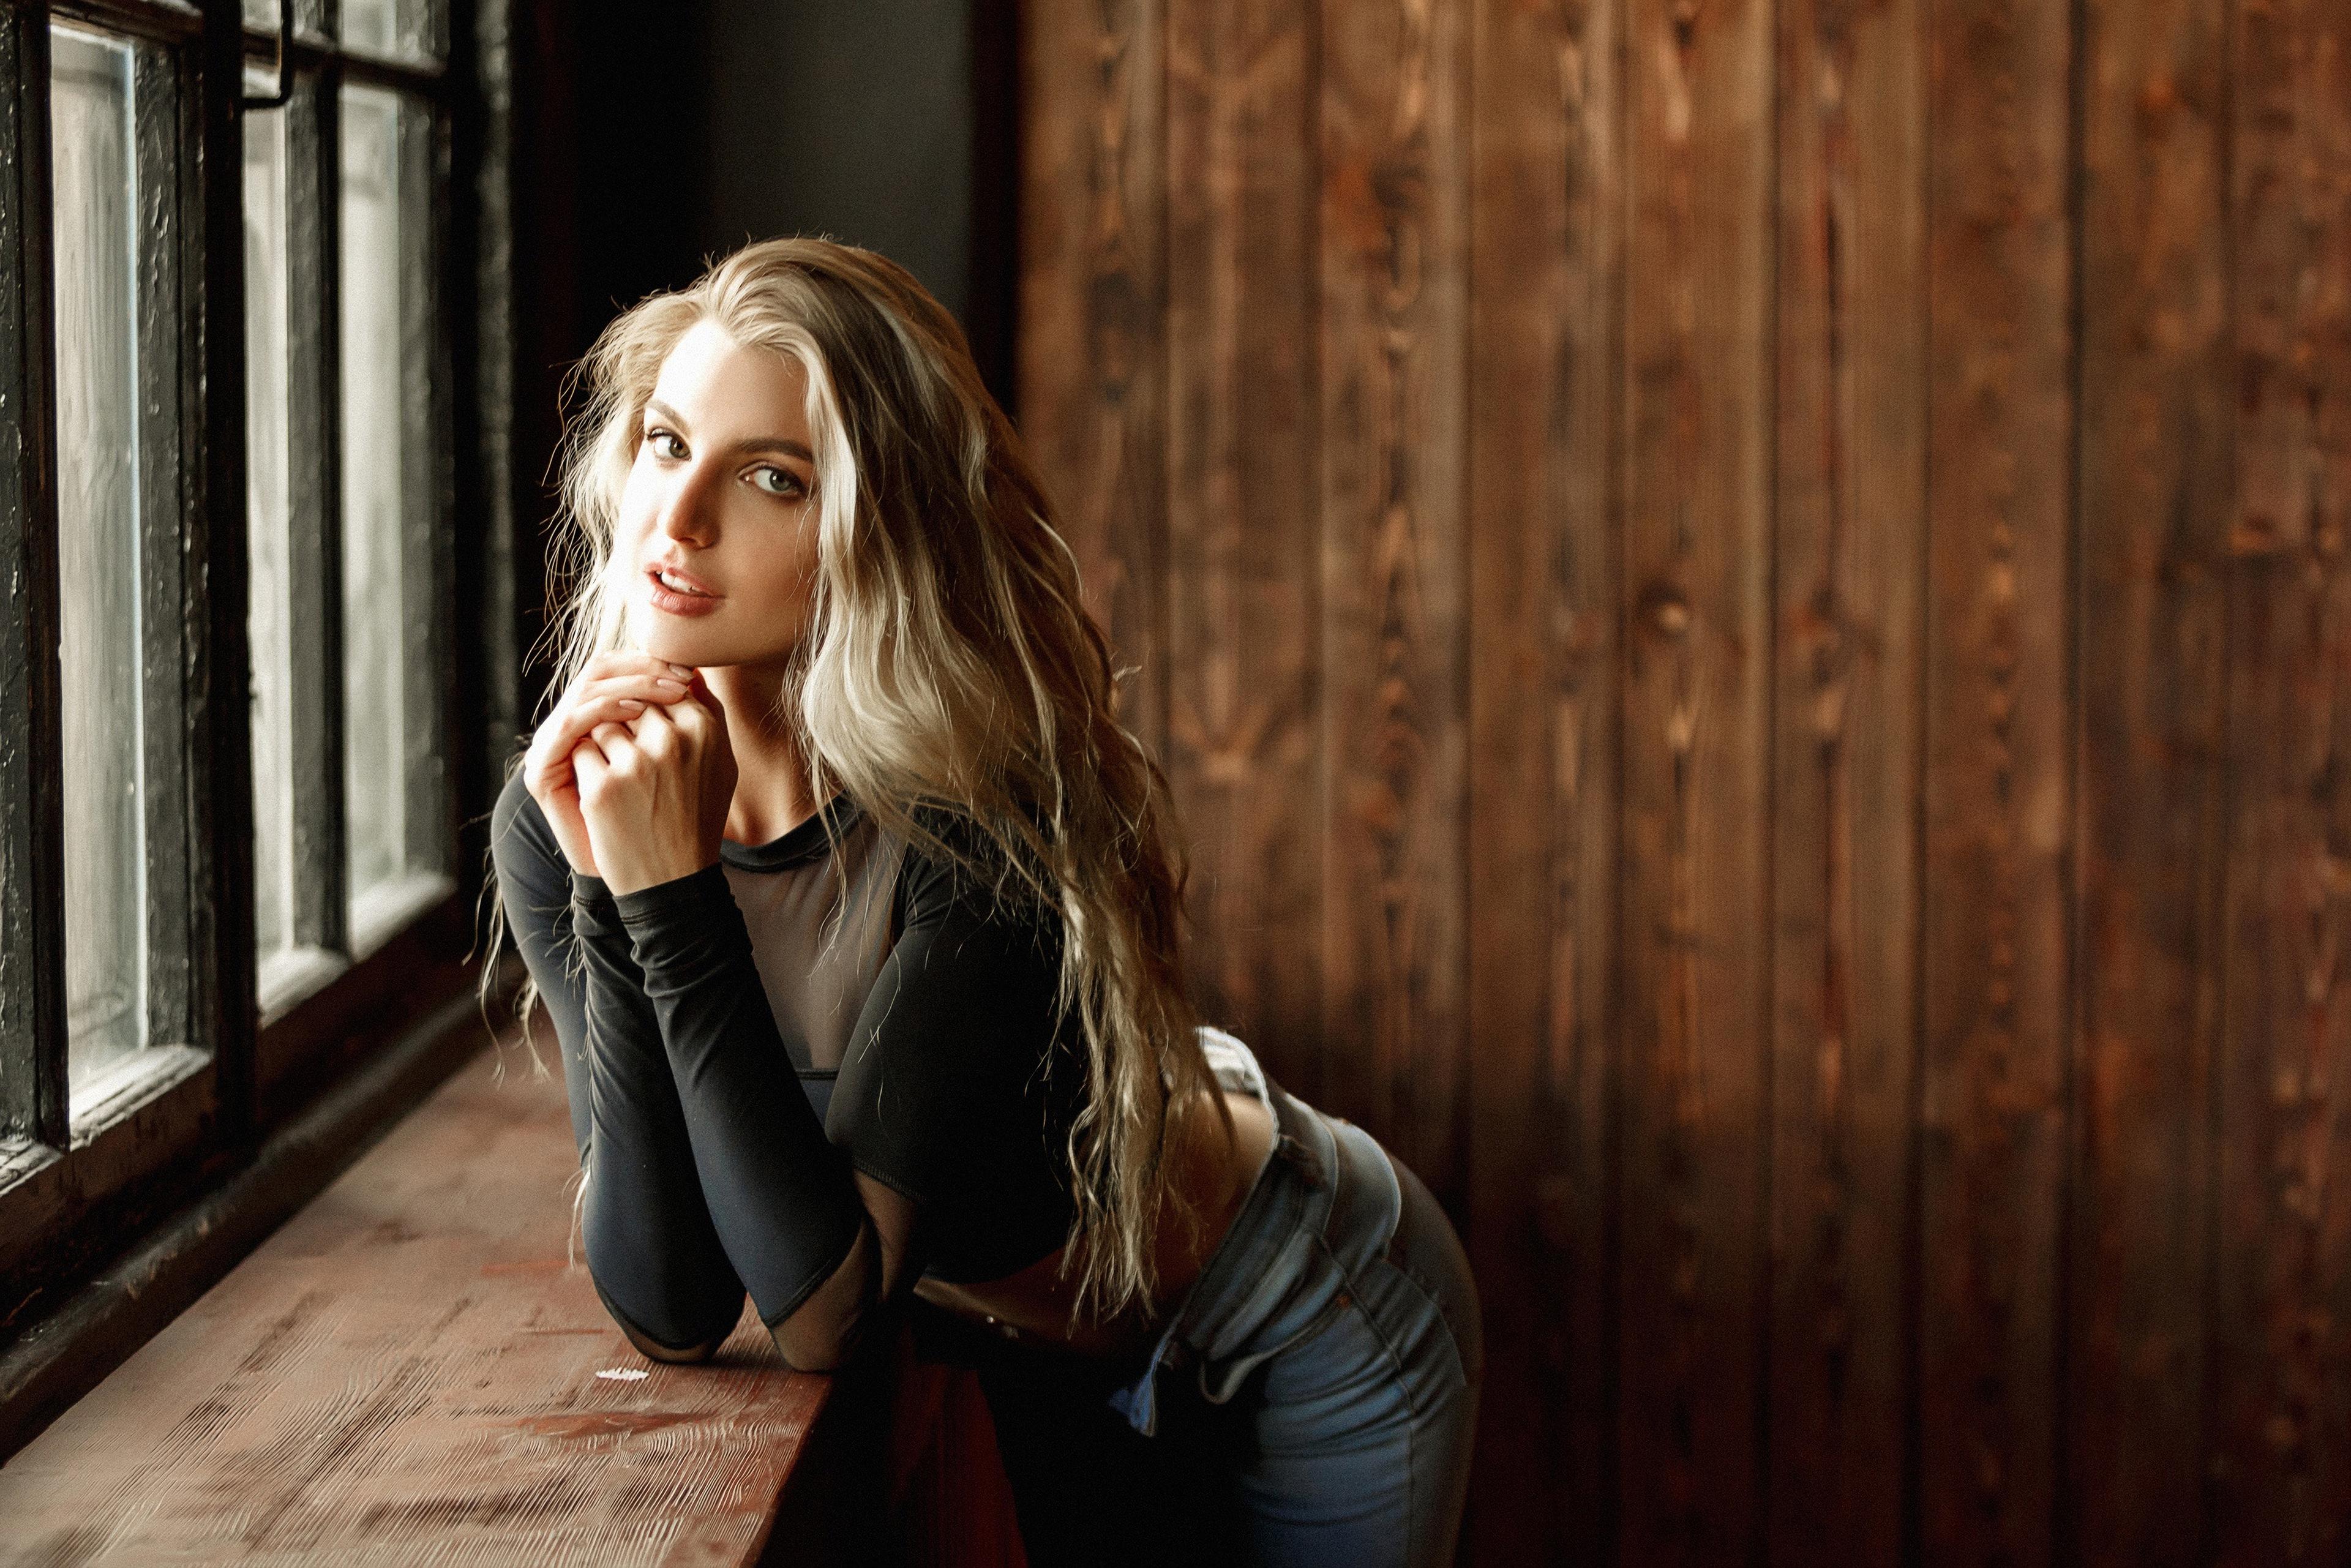 long hair blonde girl 1575665894 - Long Hair Blonde Girl -